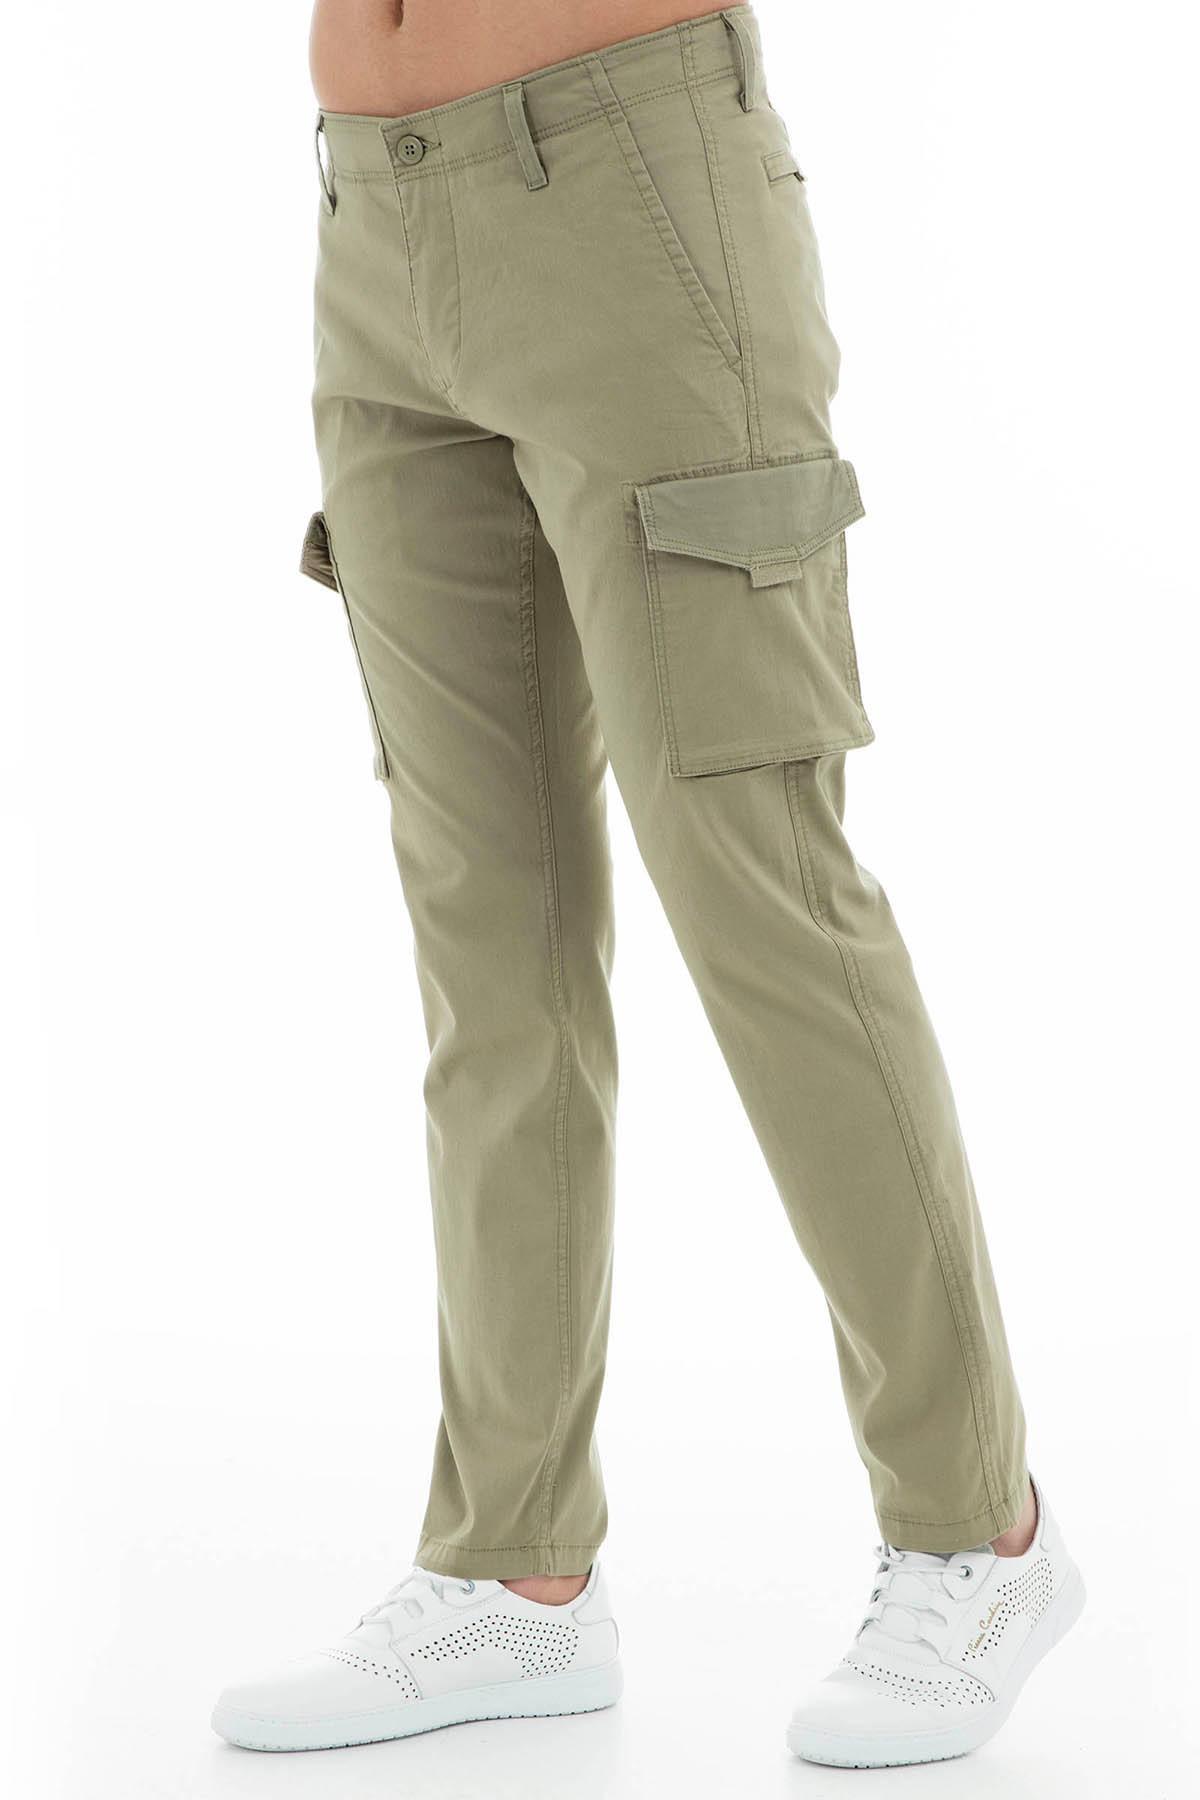 Pantalones Dockers Pantalones Masculinos 56787 Pantalones Informales Aliexpress